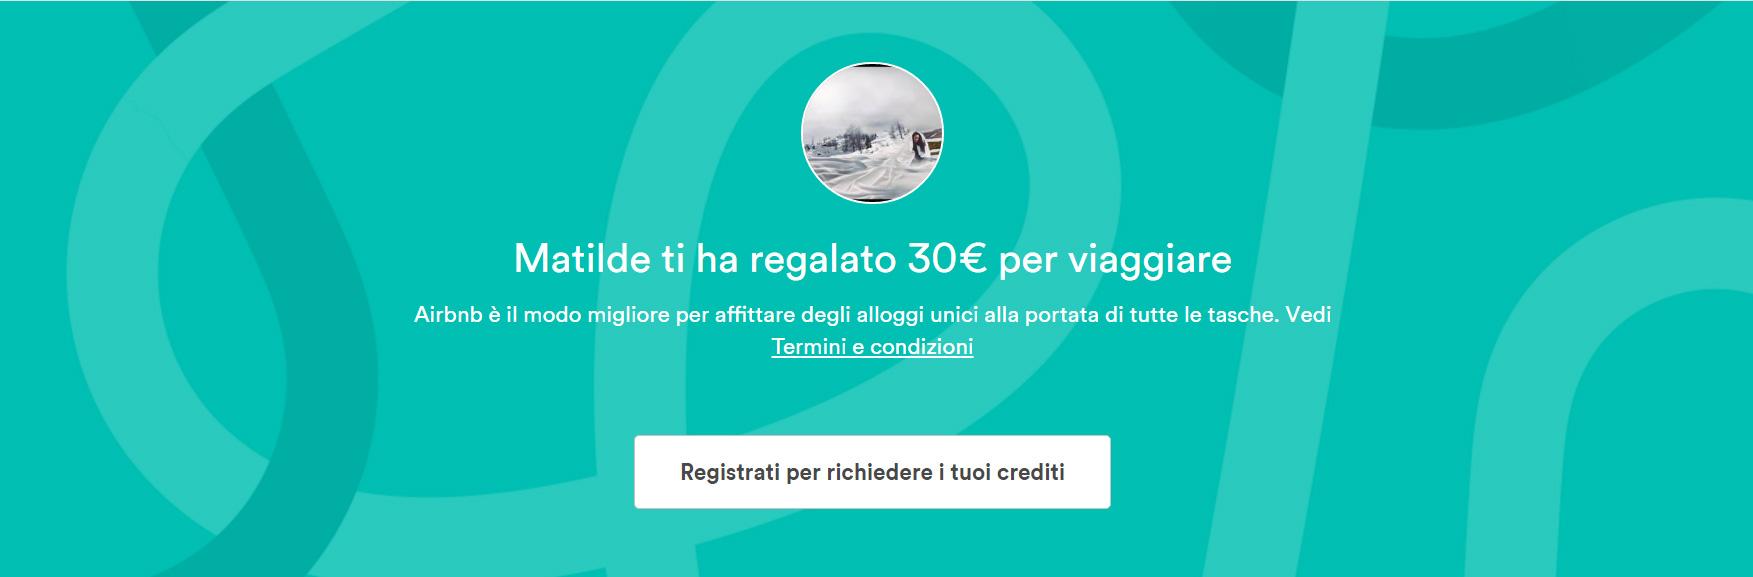 sconto-airbnb